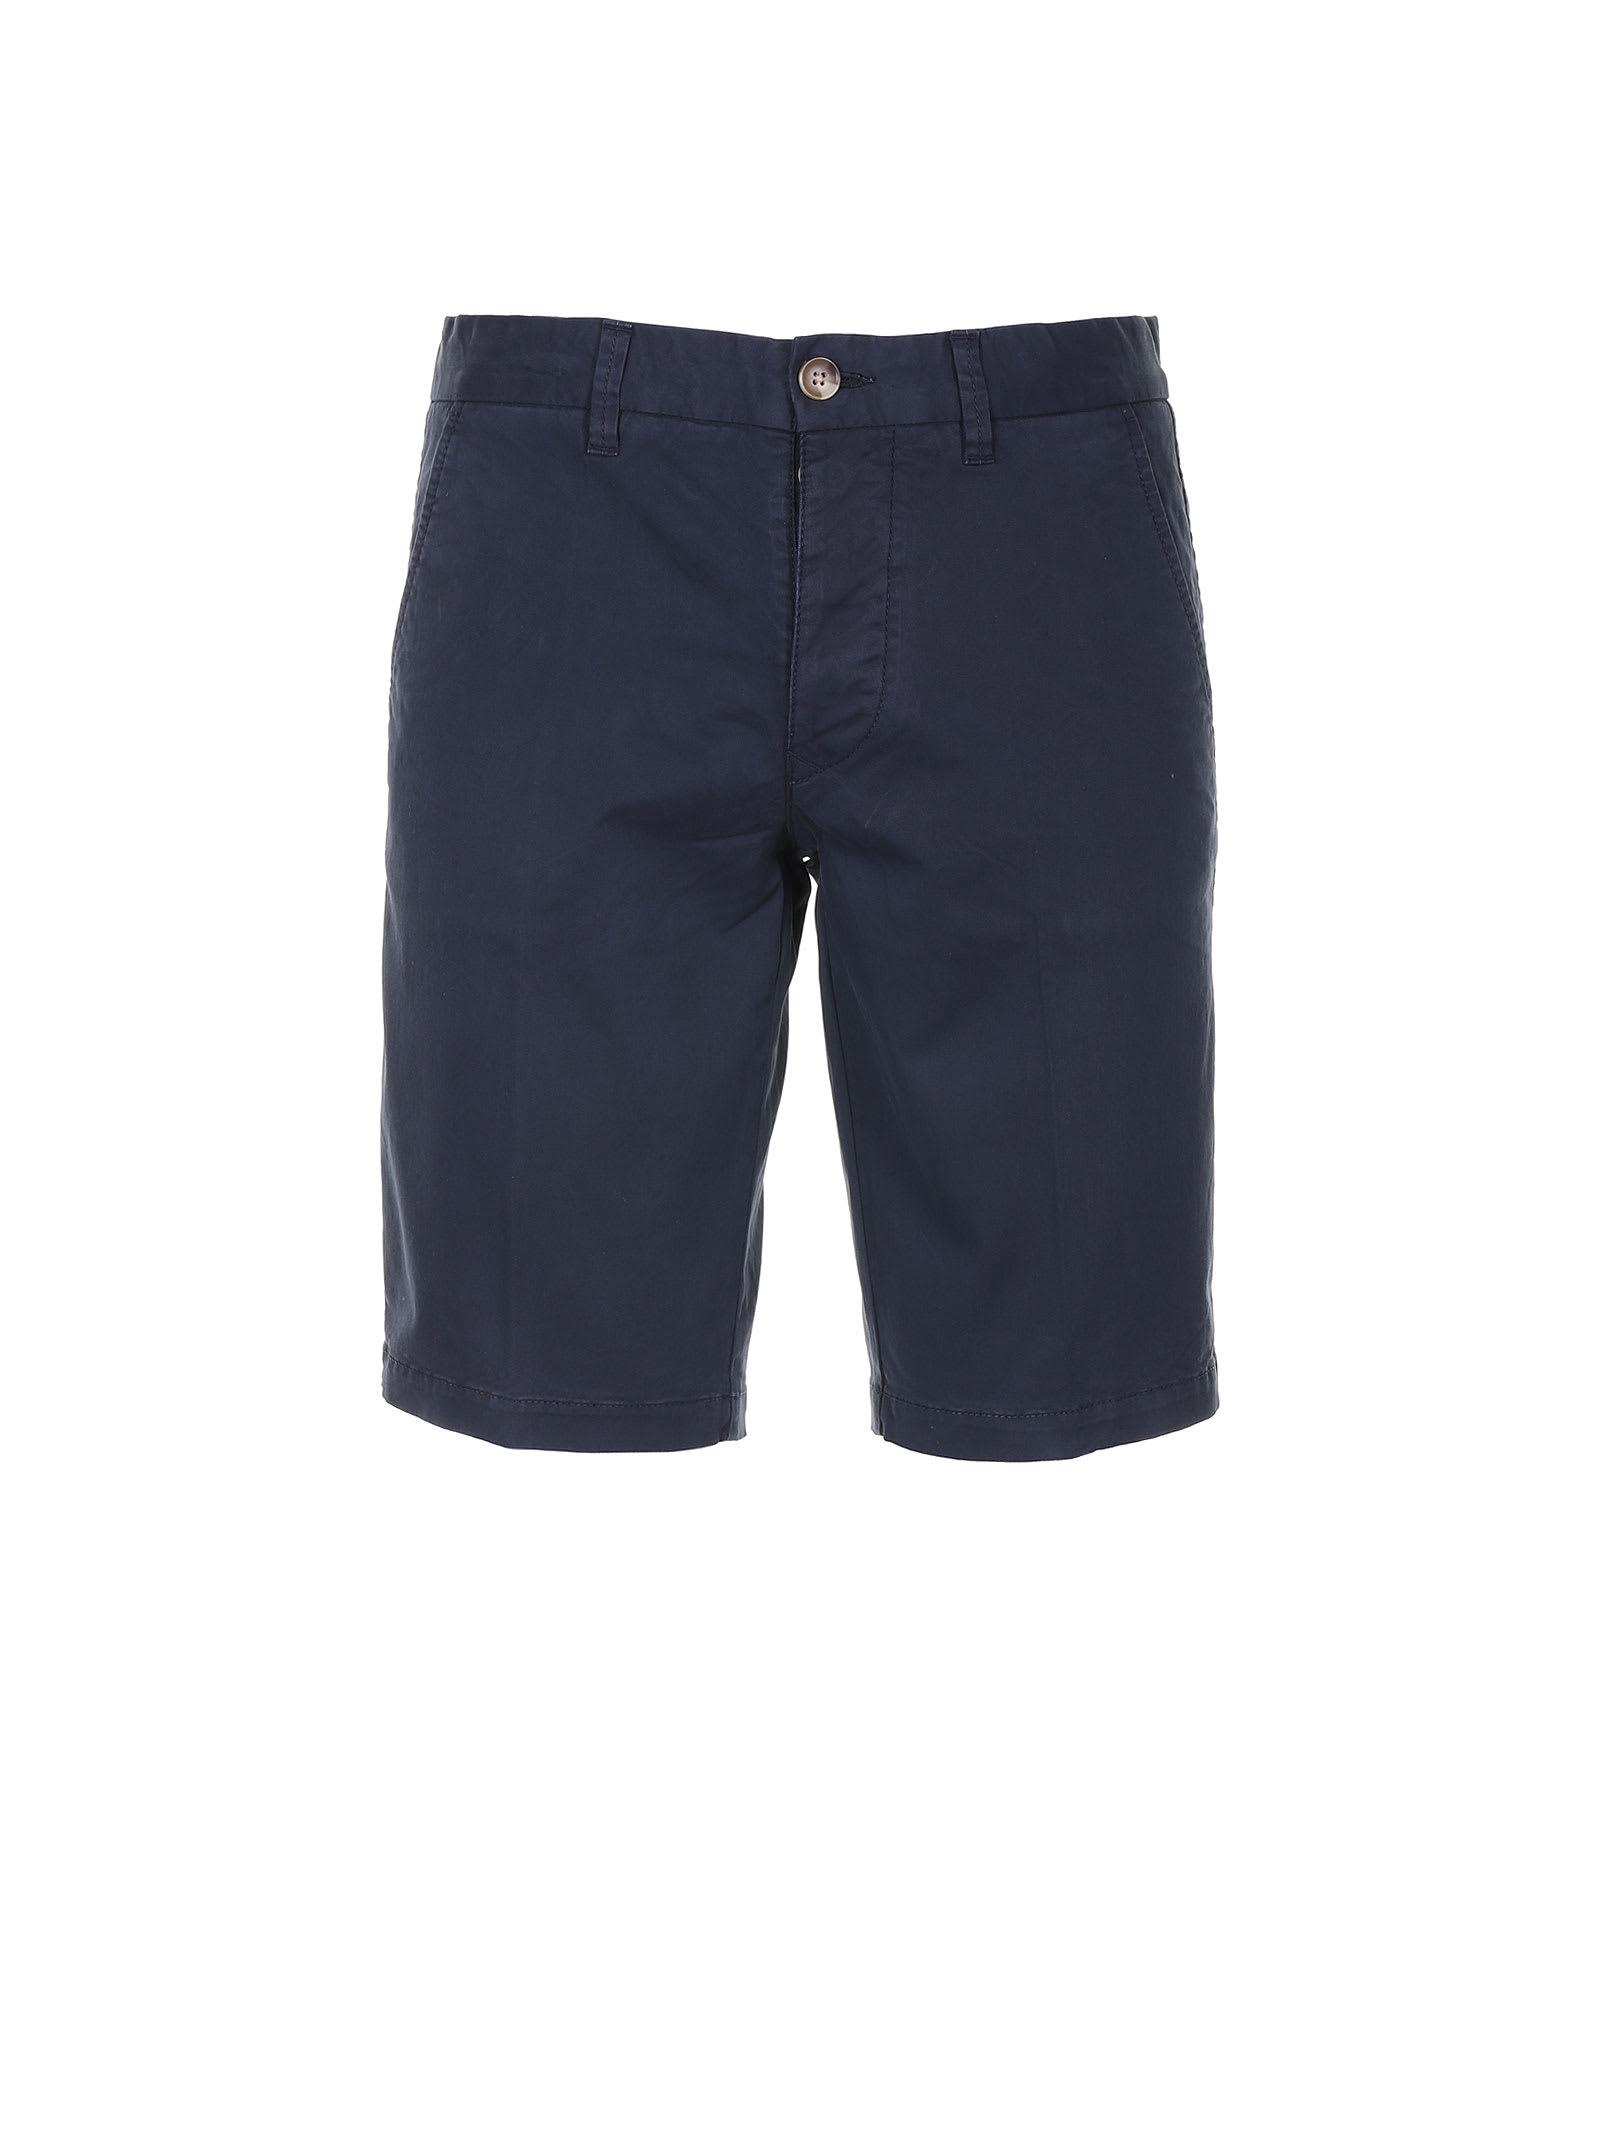 Chino Stretch Shorts